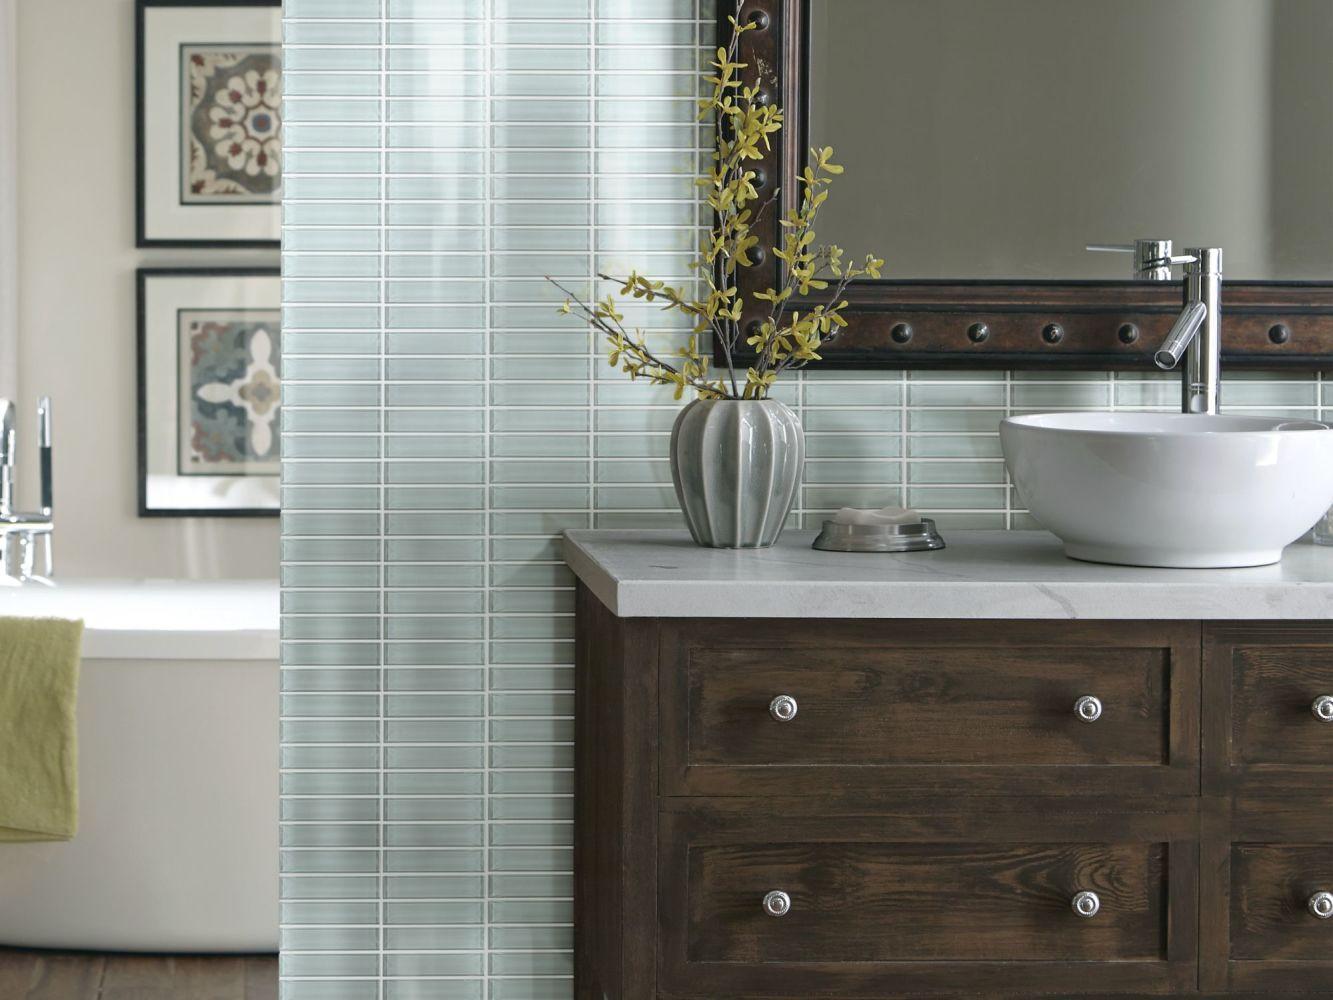 Shaw Floors Toll Brothers Ceramics Principal Stacked Glass Mosaic Cloud 00500_TL83B